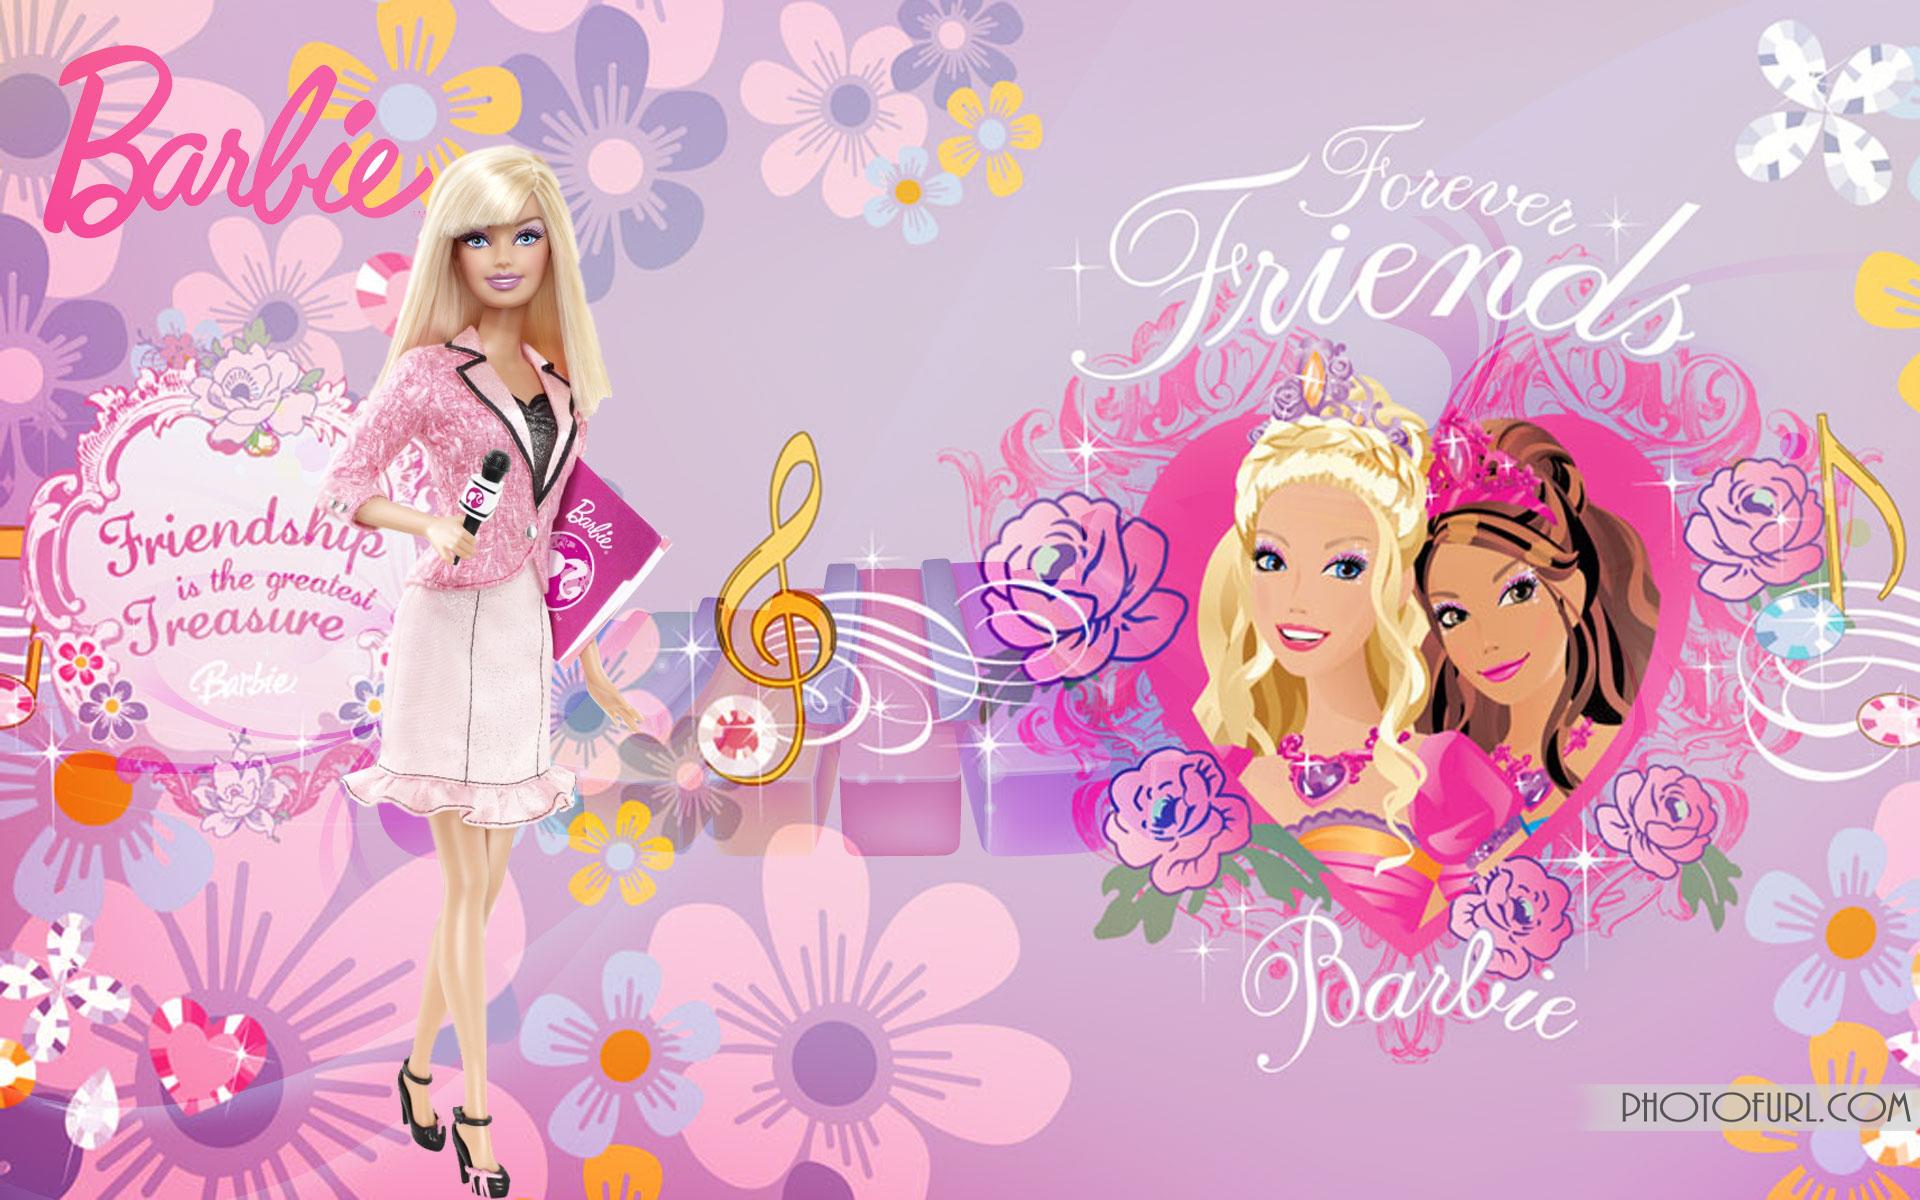 Cute Anchor Wallpapers Barbie Wallpaper Anchor Hd Desktop Wallpapers 4k Hd